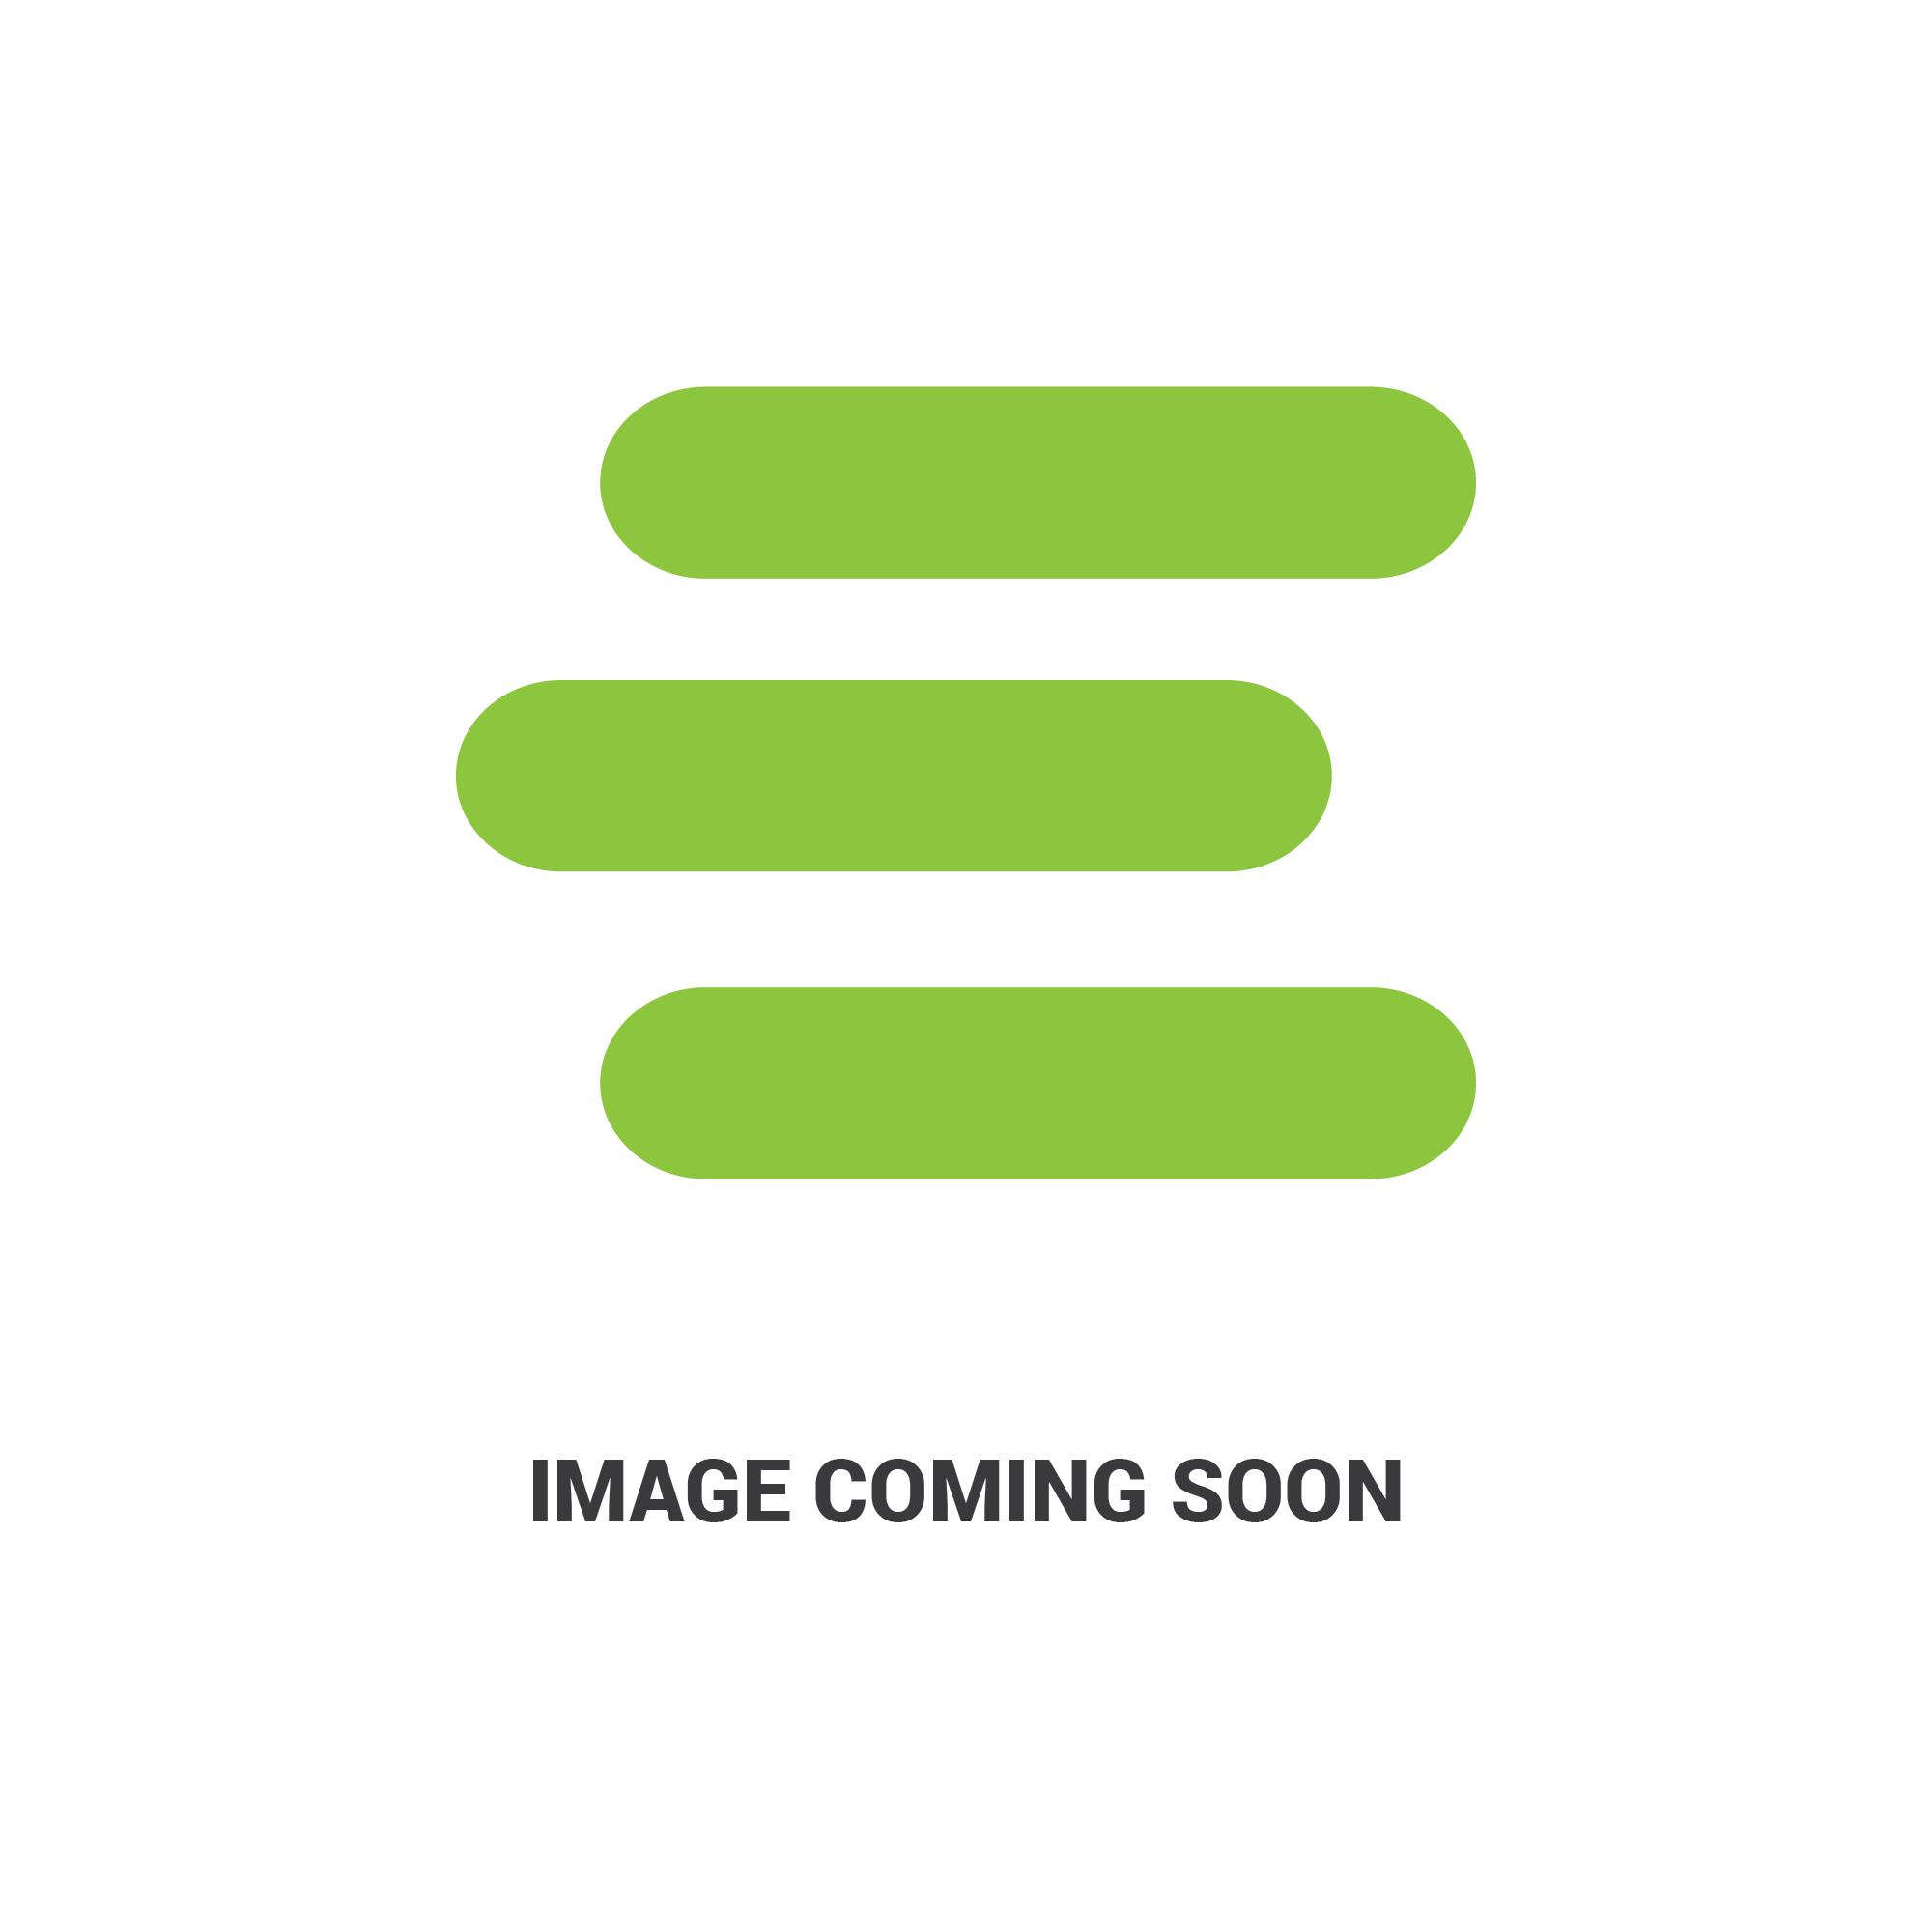 E-31381-763901866_1.jpg